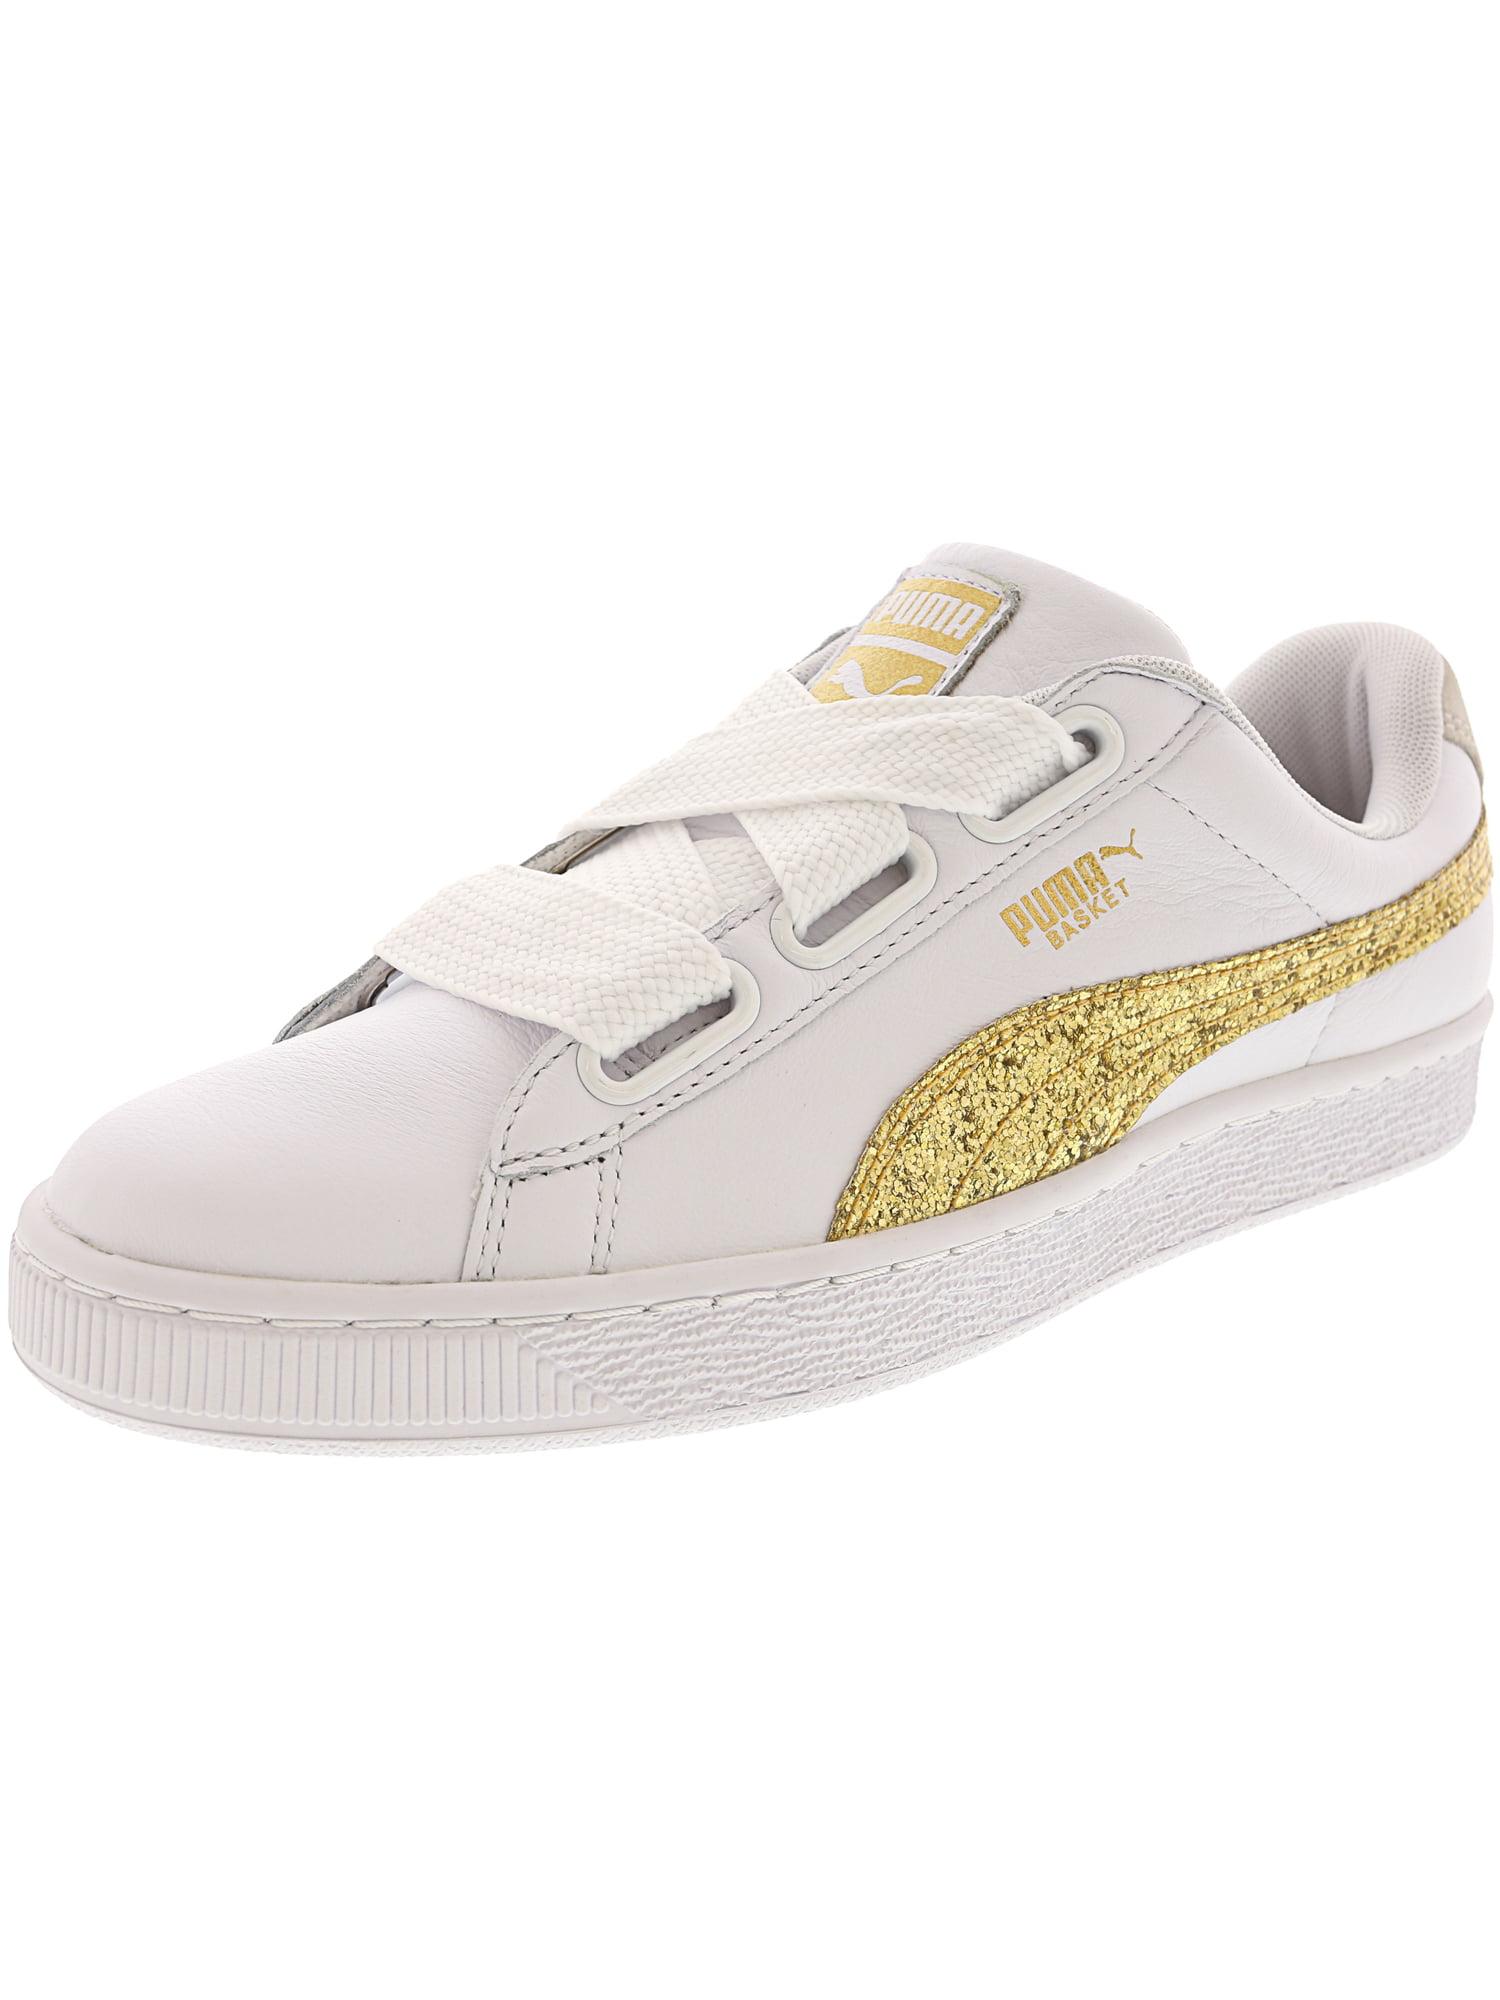 Puma Women's Basket Heart Glitter Fashion Sneaker - 9M - Puma White - Gold